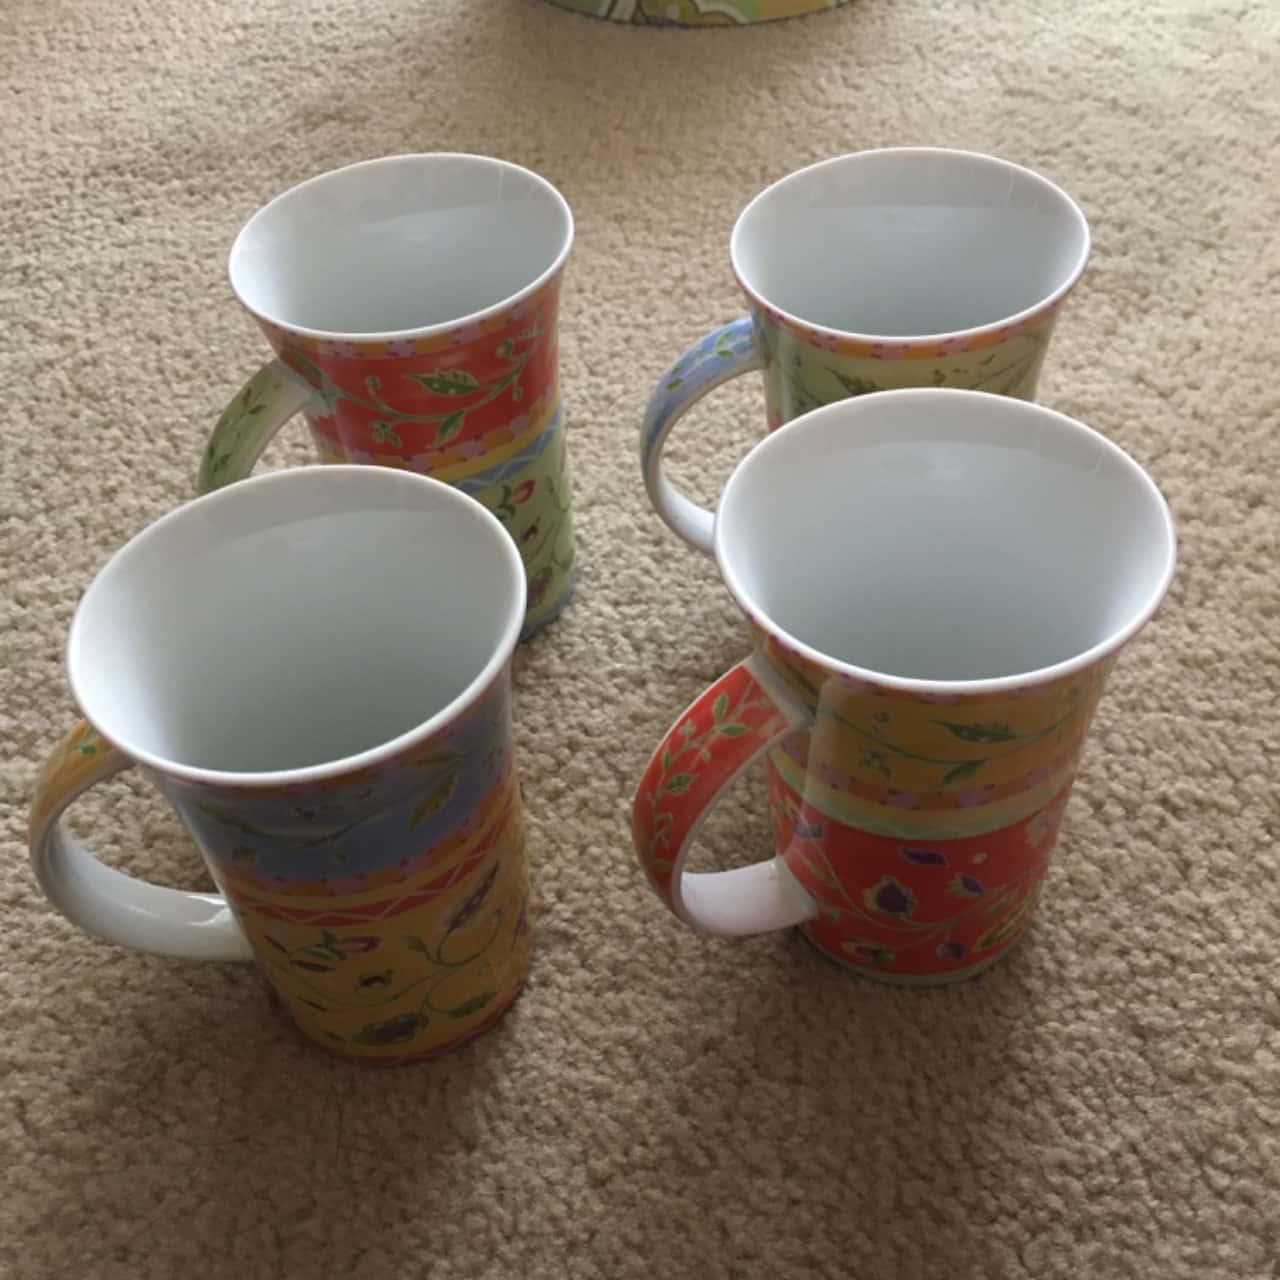 Maxwell & Williams Gift Set of 4 Mugs - Brand New